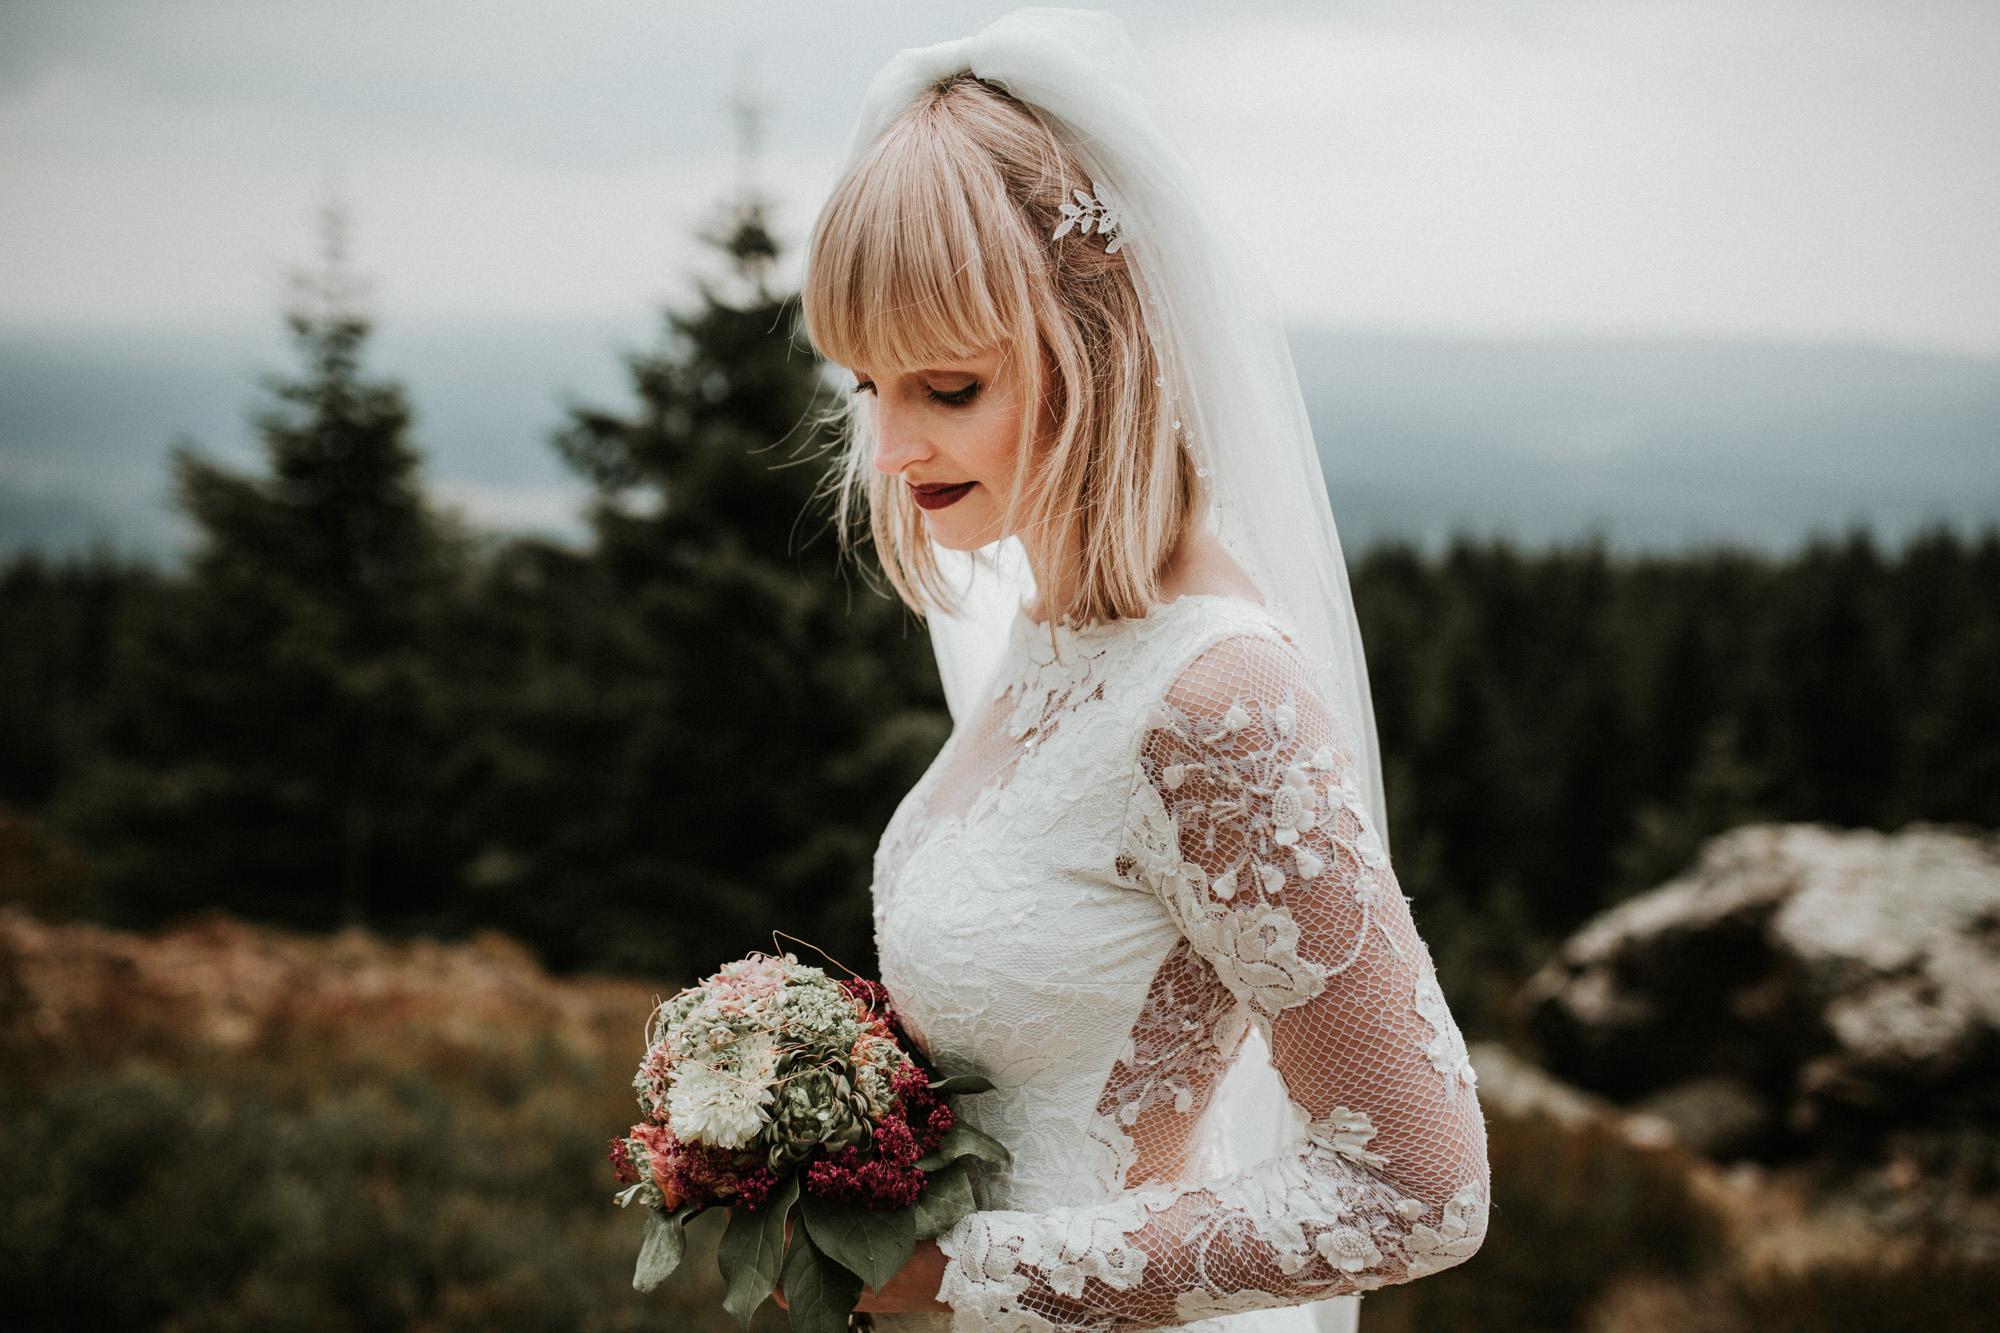 DanielaMarquardtPhotography_Hochzeitsfotograf_Düsseldorf_Köln_Mallorca_Bayern_Austria_Harz_LinaundMaik_Afterwedding-Shooting_Weddingphotographer_Ibiza_Tuskany_Italien_Toskana111